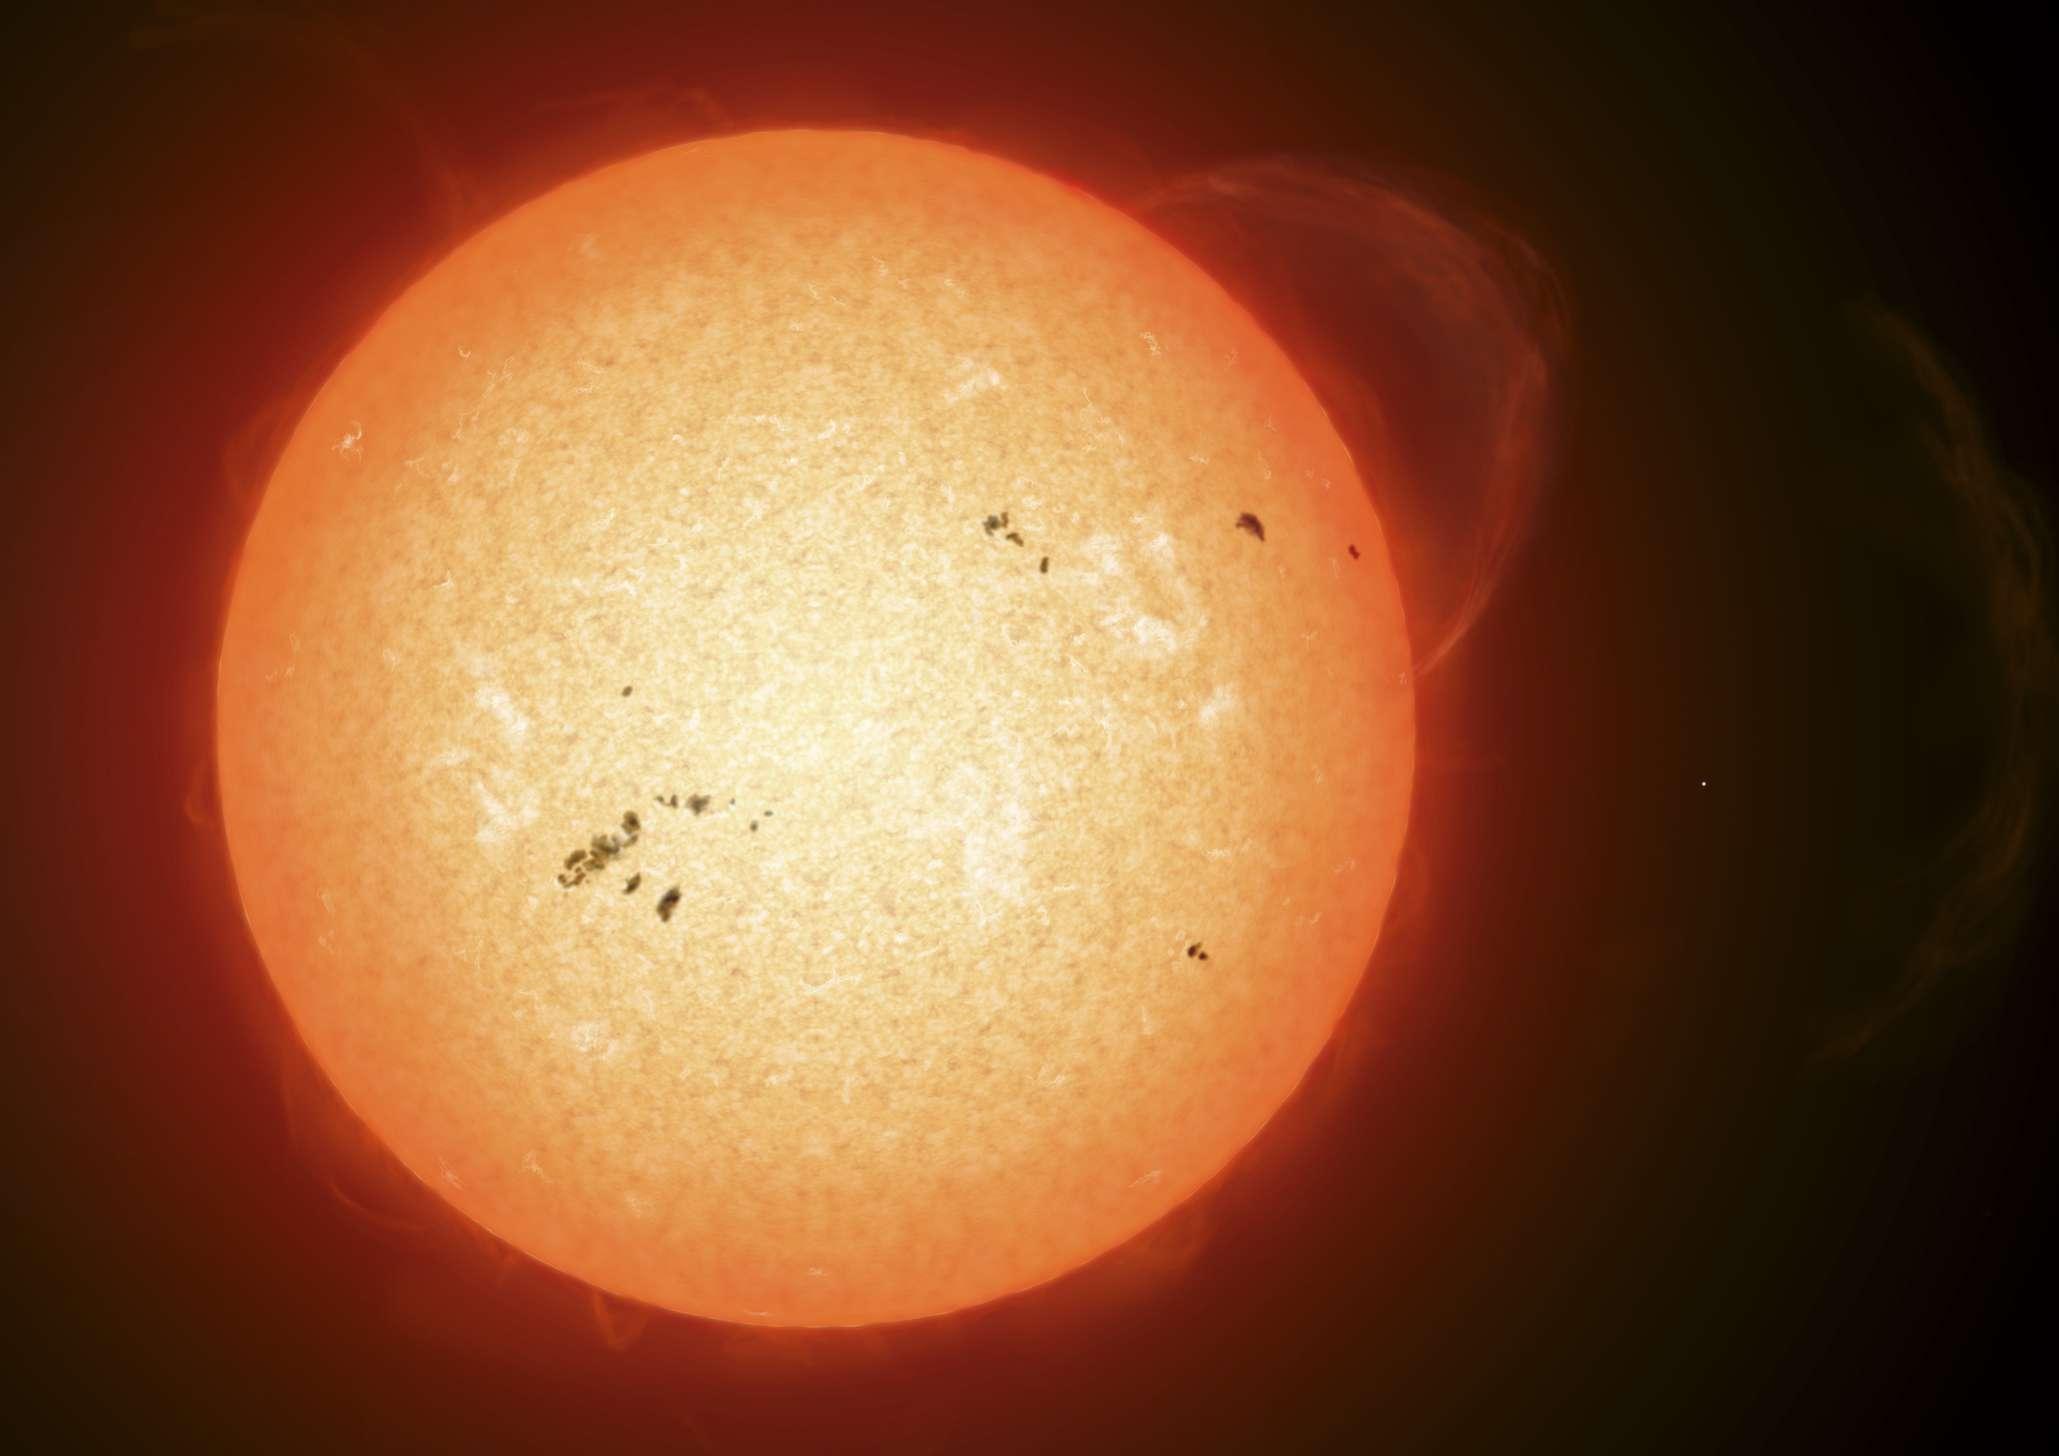 Dark sunspots visible on the Sun's surface.